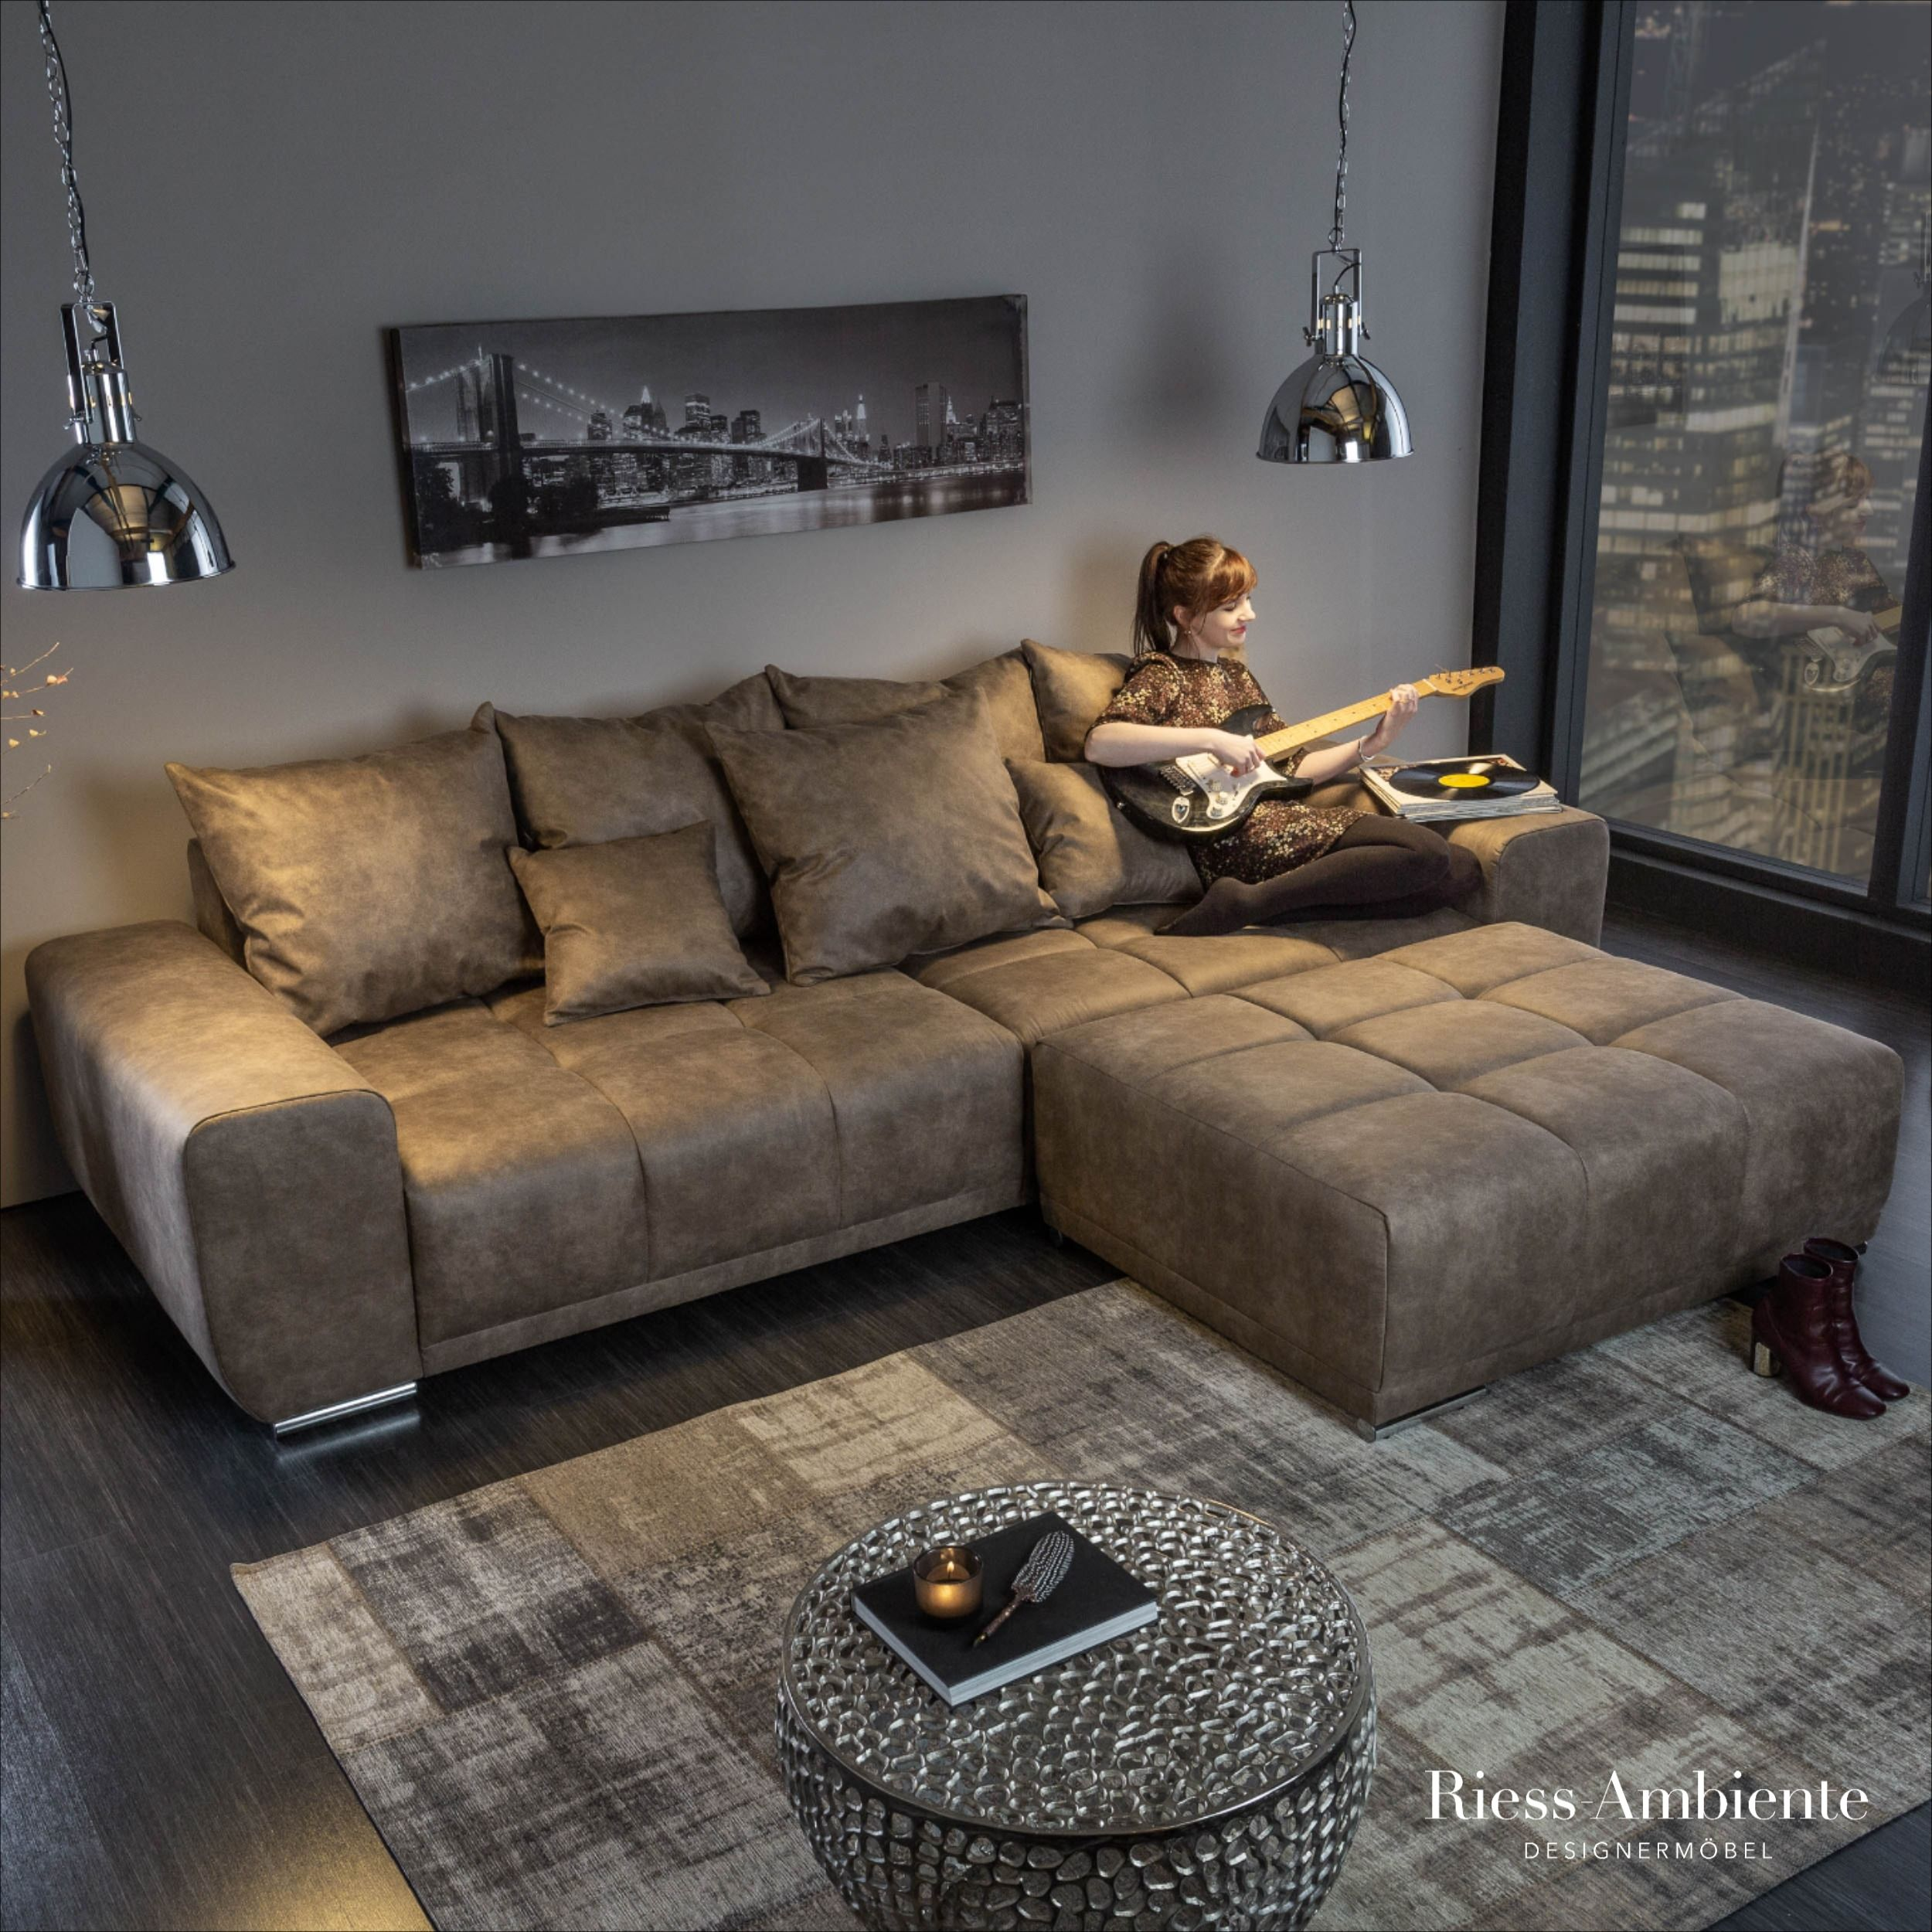 Extravagantes Xxl Sofa Elegancia 280cm Taupe Inkl Kissen Bigsofa In 2020 Xxl Sofa Hochglanz Mobel Modernes Wohnen